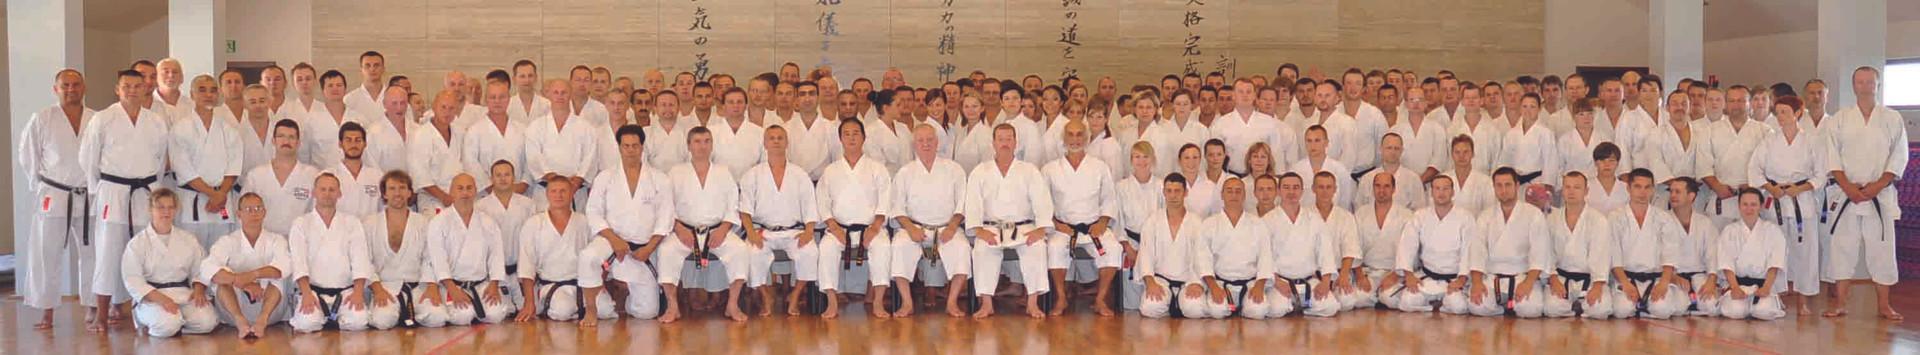 2010 itkf1.jpg